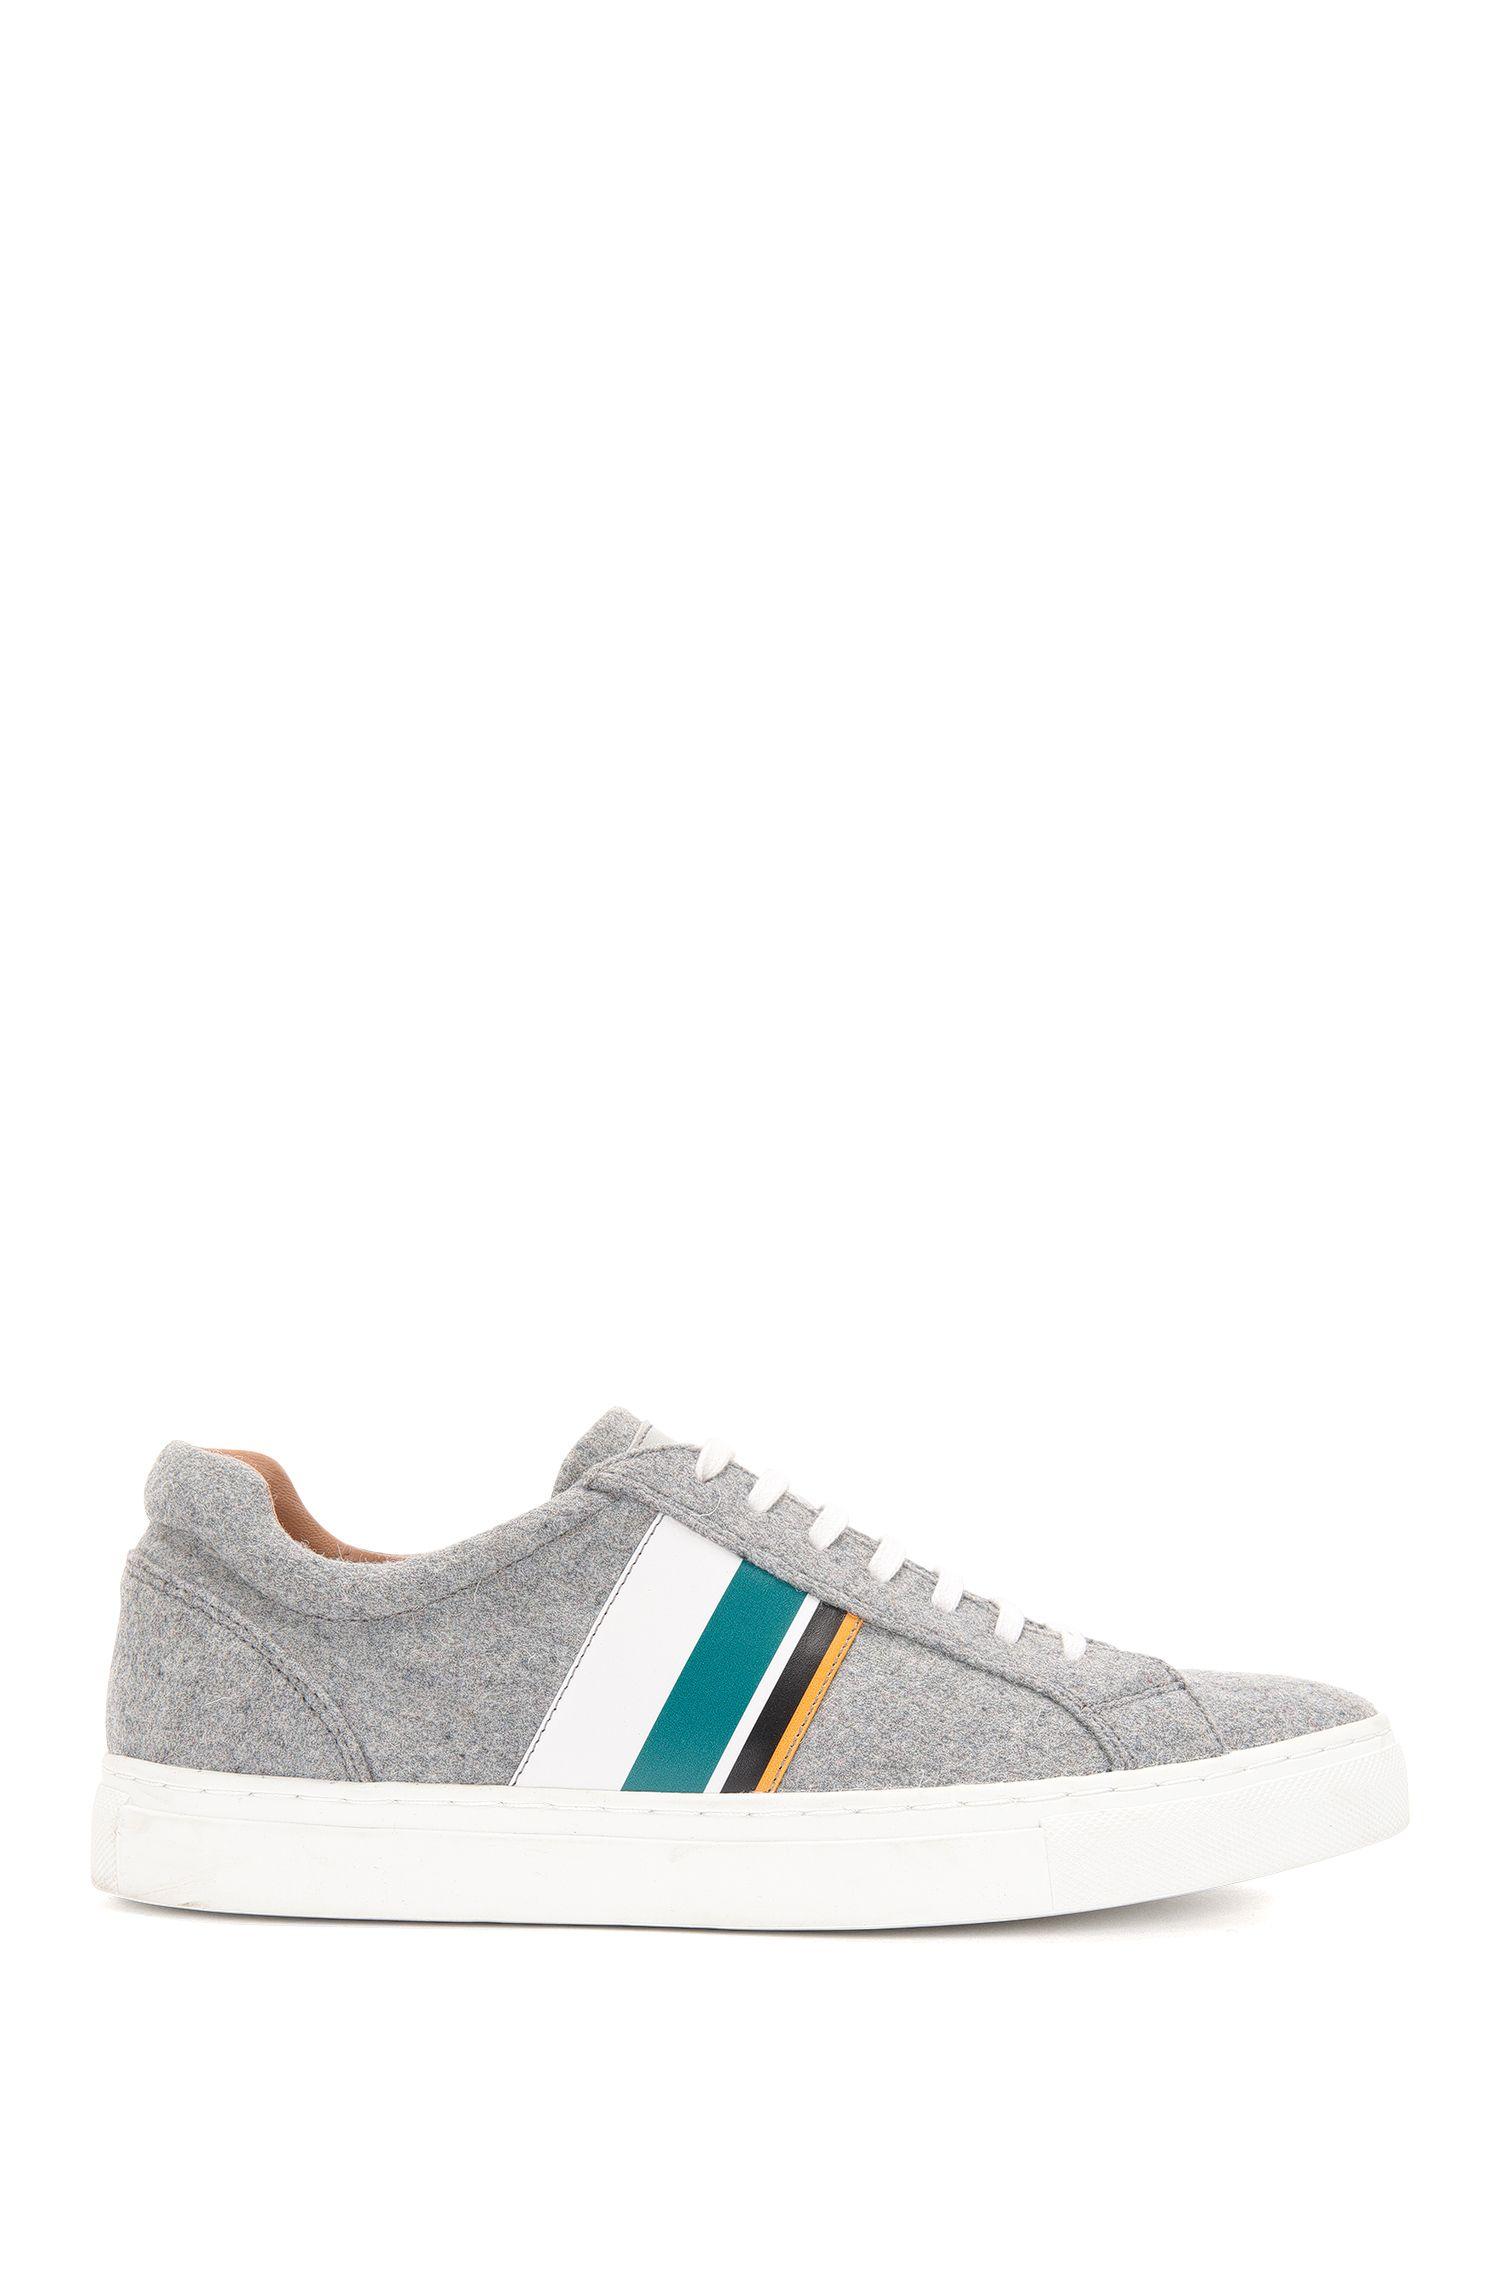 'Low Cut LB' | Wool Calfskin Sneakers